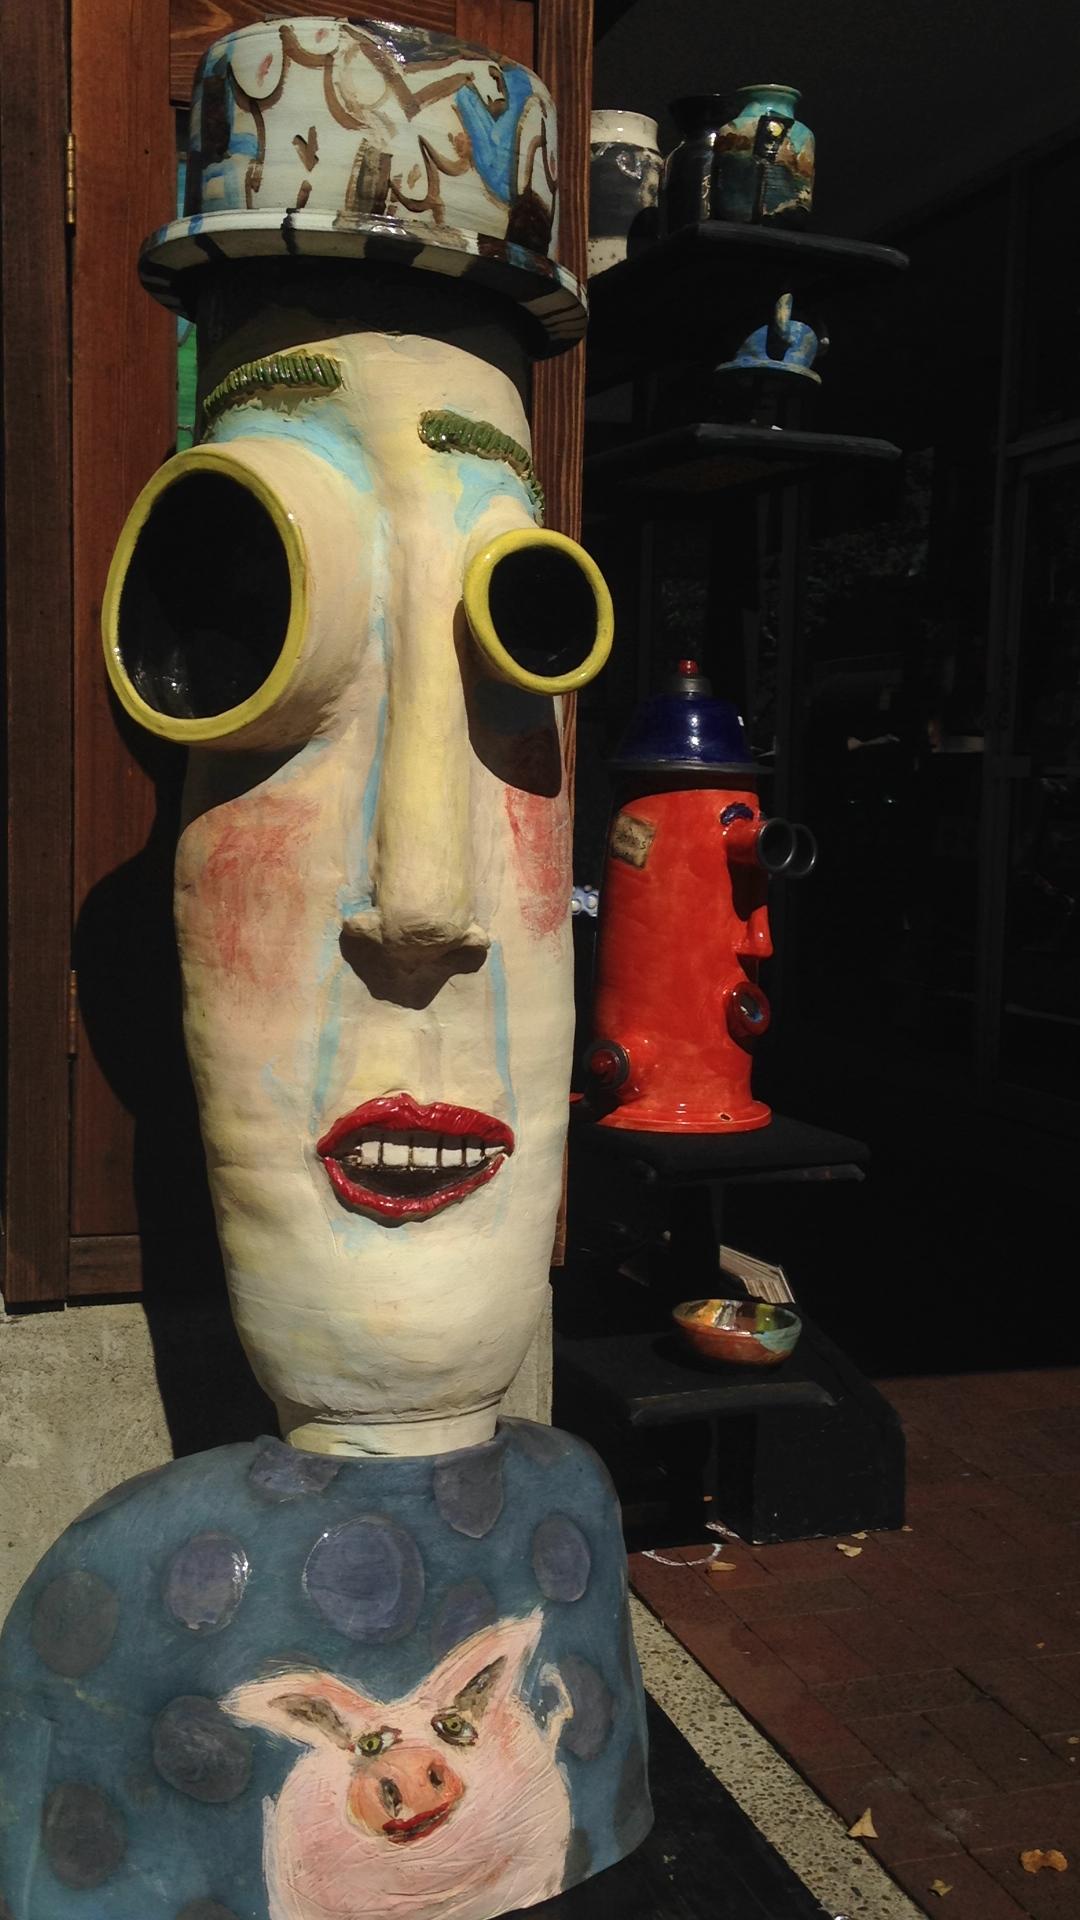 Chris Efstraris's ceramic sculpture grins at pedestrians at the Menlo Park Fine Arts & Crafts Fall Fest on Oct. 5, 2014 in Menlo Park, Calif. (Miranda Shepherd/Peninsula Press)